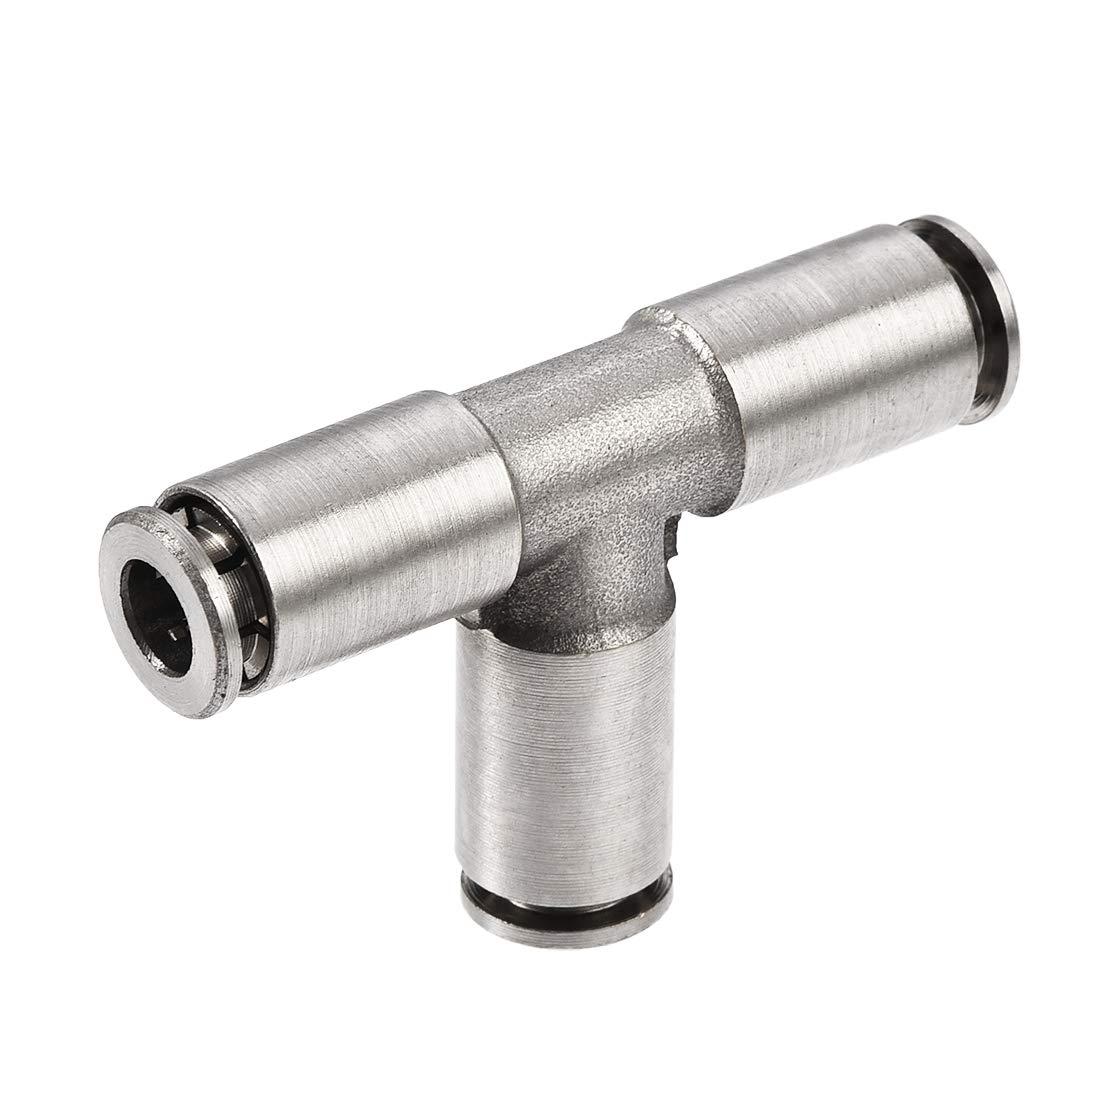 Thinwall E-Z LOK Thread Inserts Steel Thd. 7//16-14 Ext 1 Each Fine Thd. .437 Lg. 5//16-24 Int